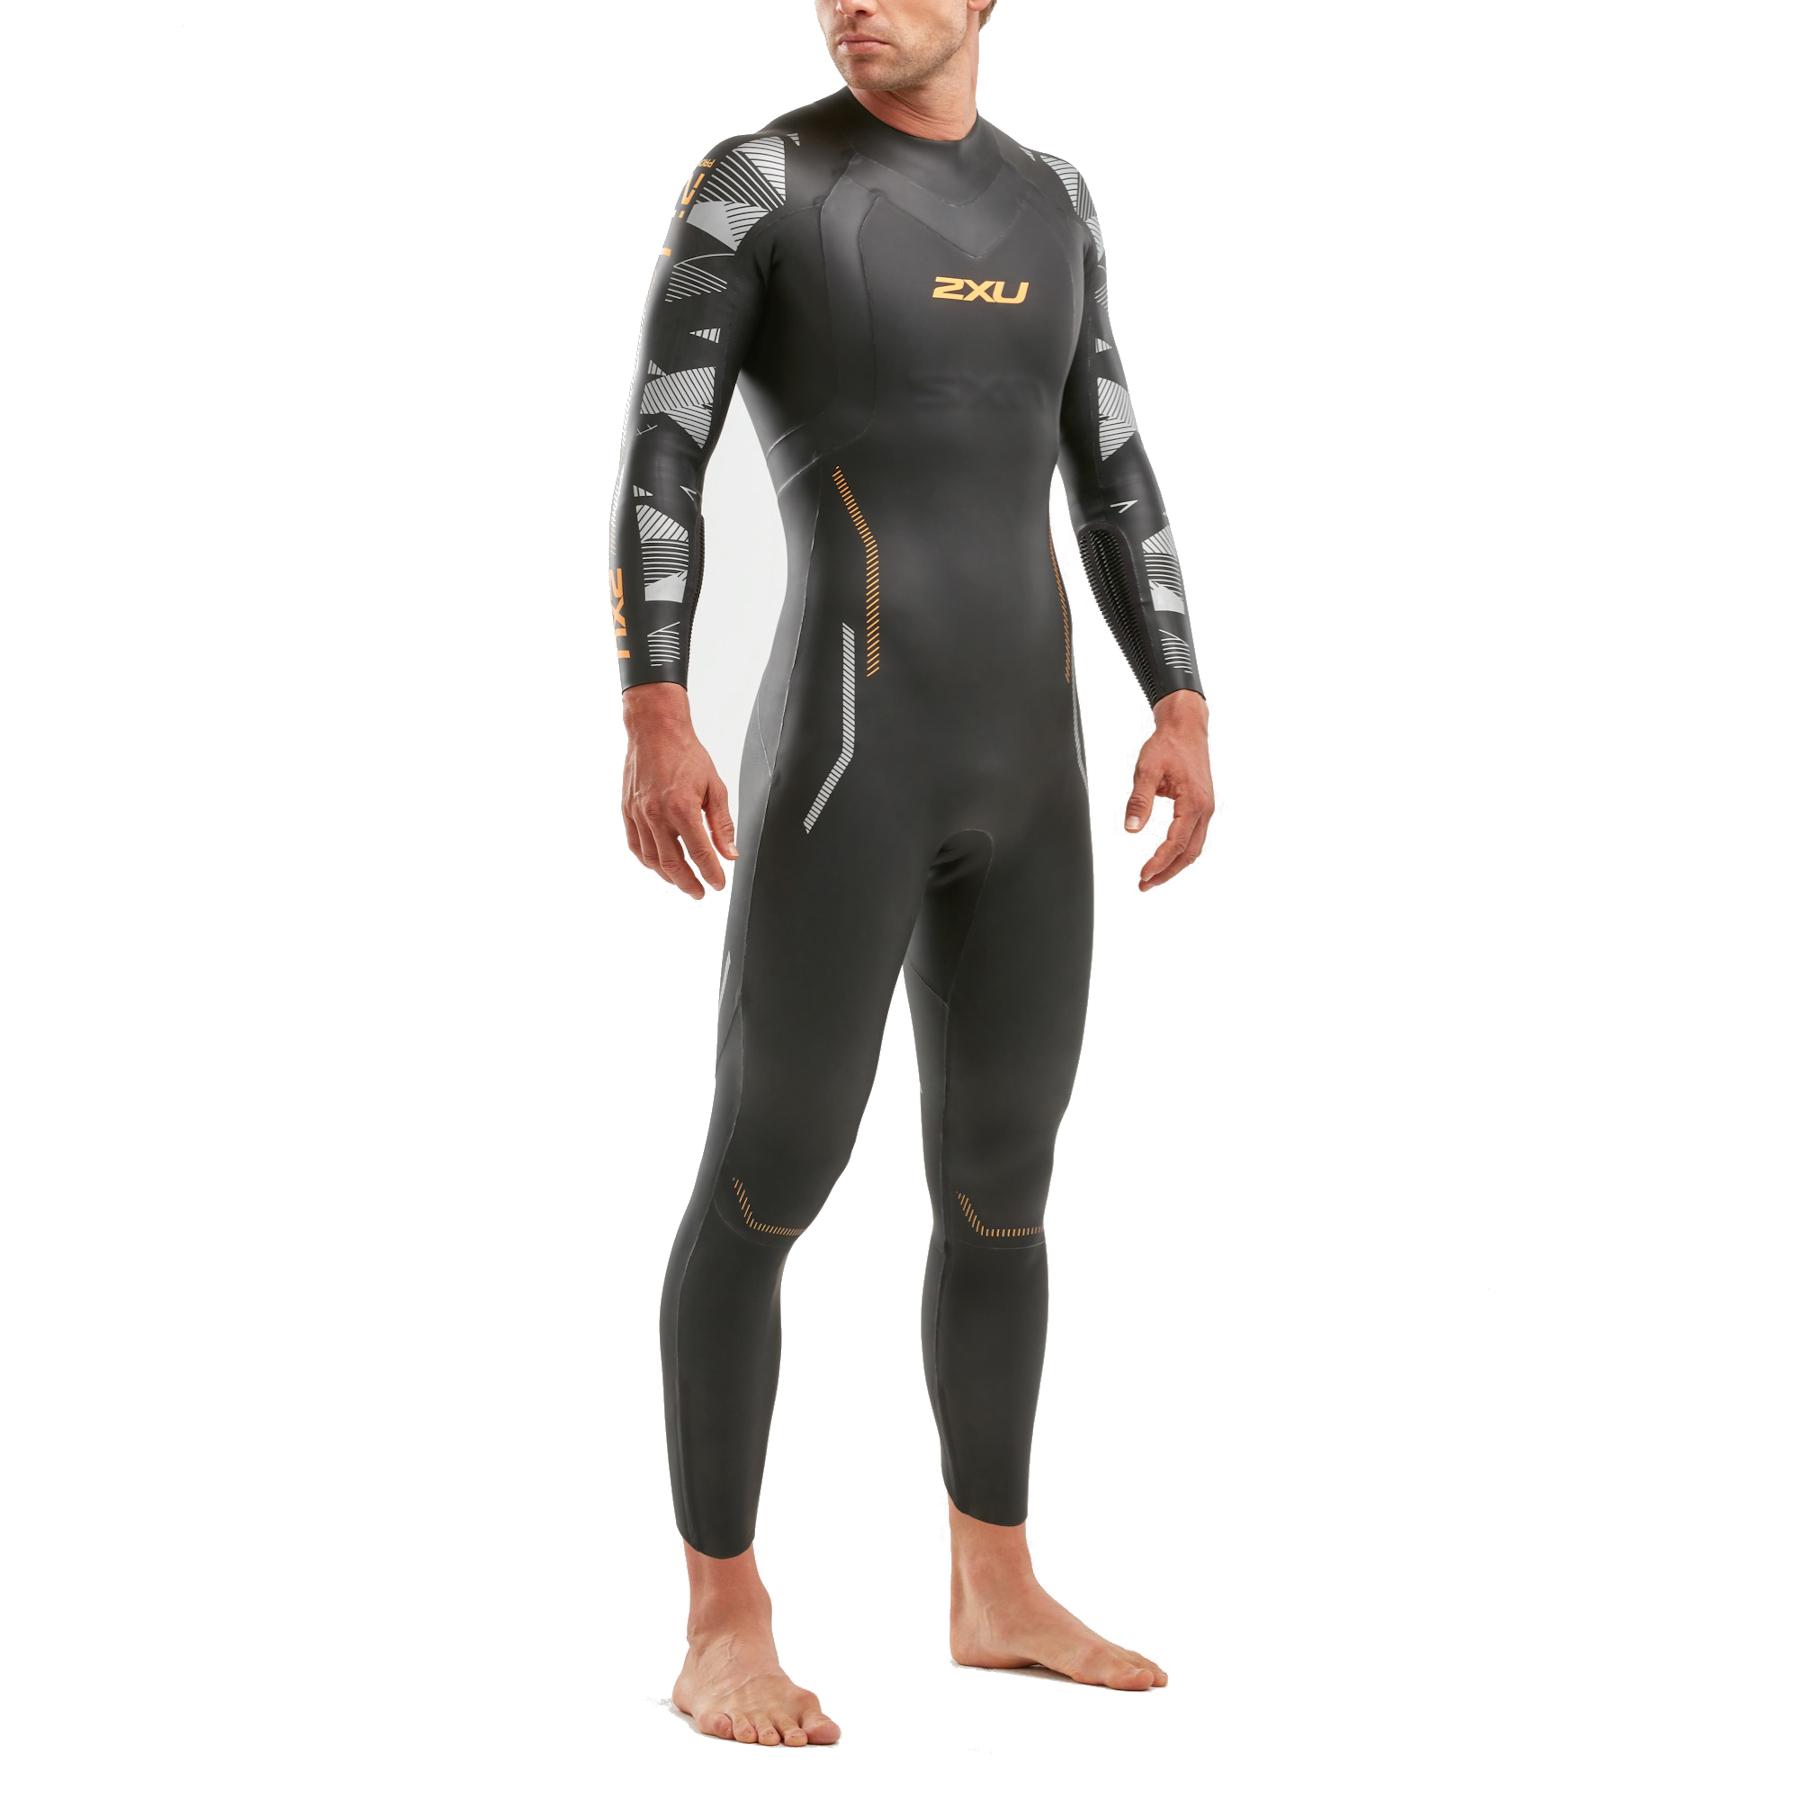 2XU P:2 Propel Wetsuit - black/orange fizz